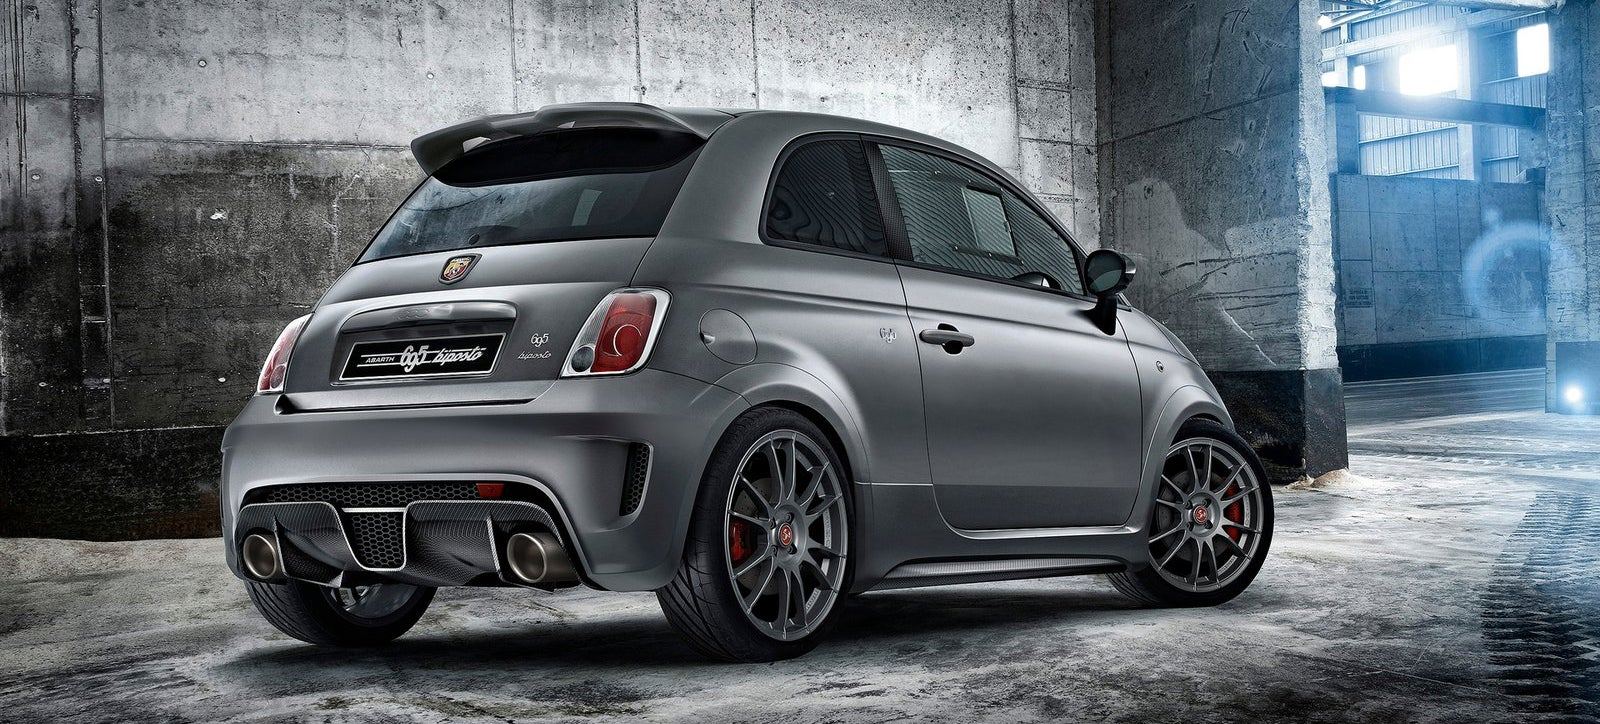 Populaire Fiat 500 abarth News, Videos, Reviews and Gossip - Jalopnik EX77